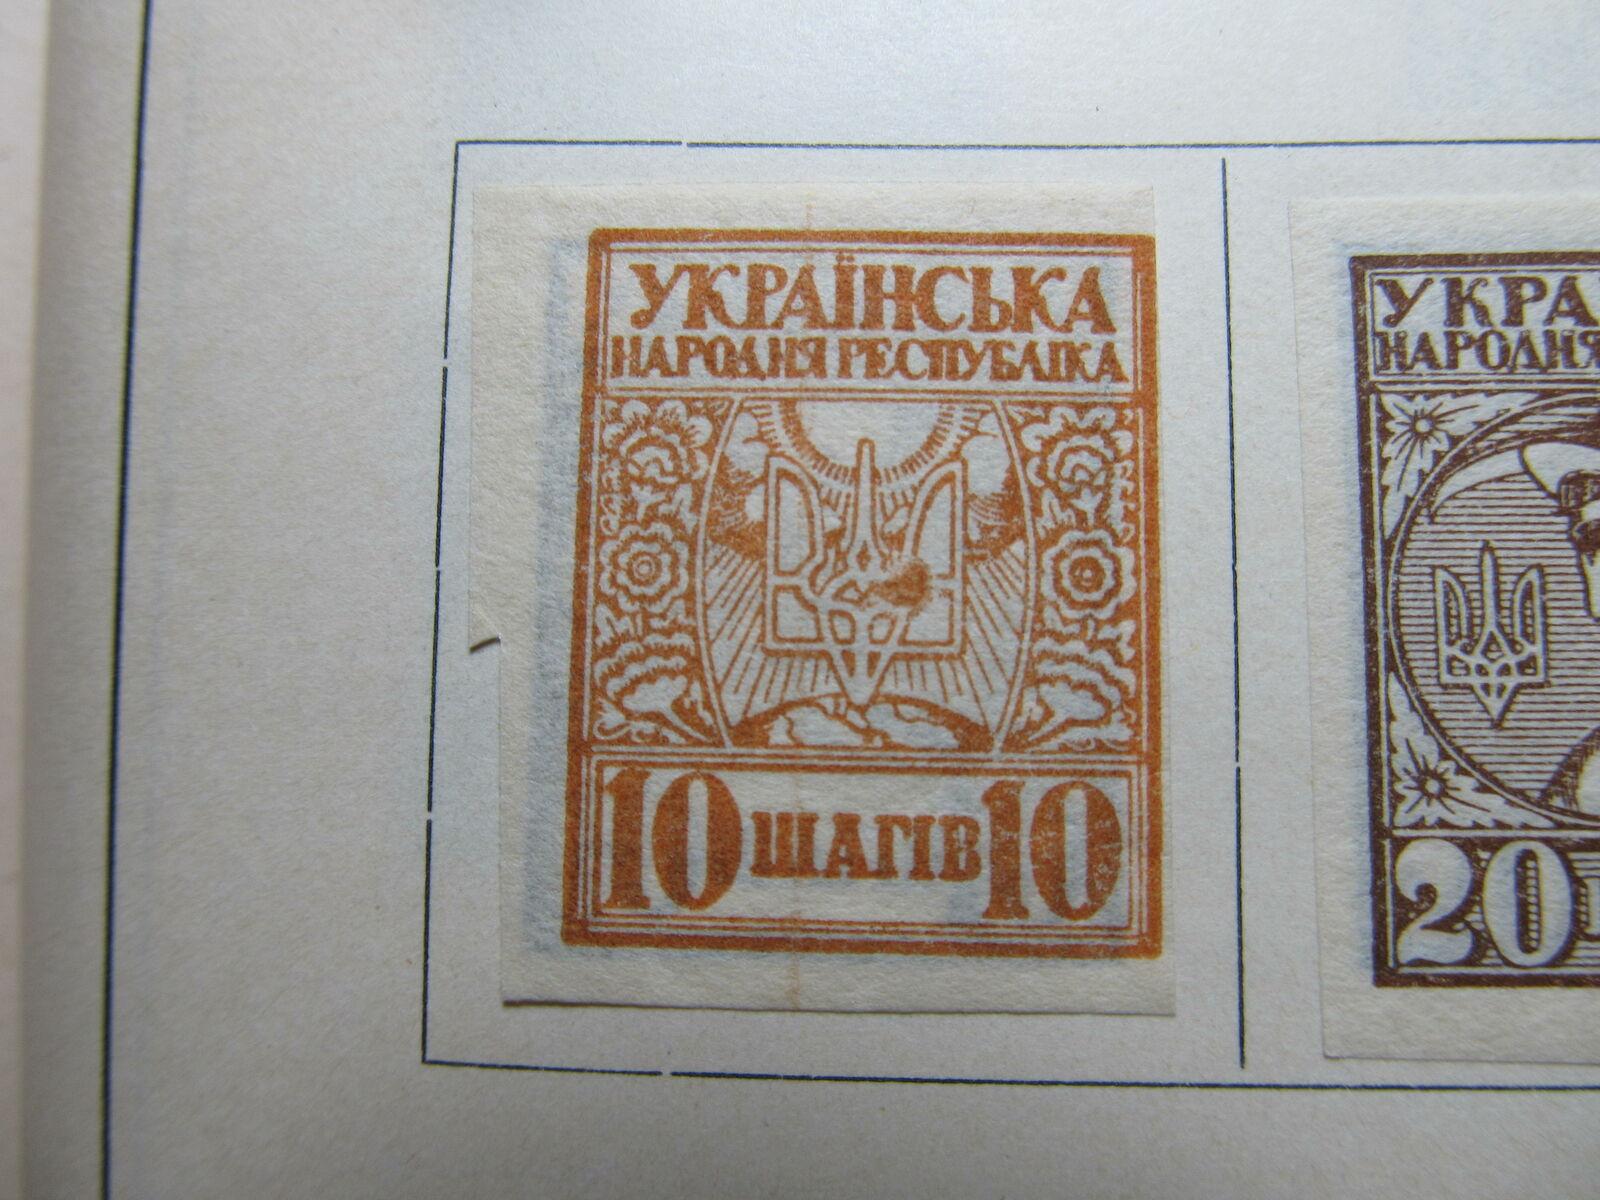 Ukraine Ucraina 1918 10sh Imperf Fine MH* A5P21F234